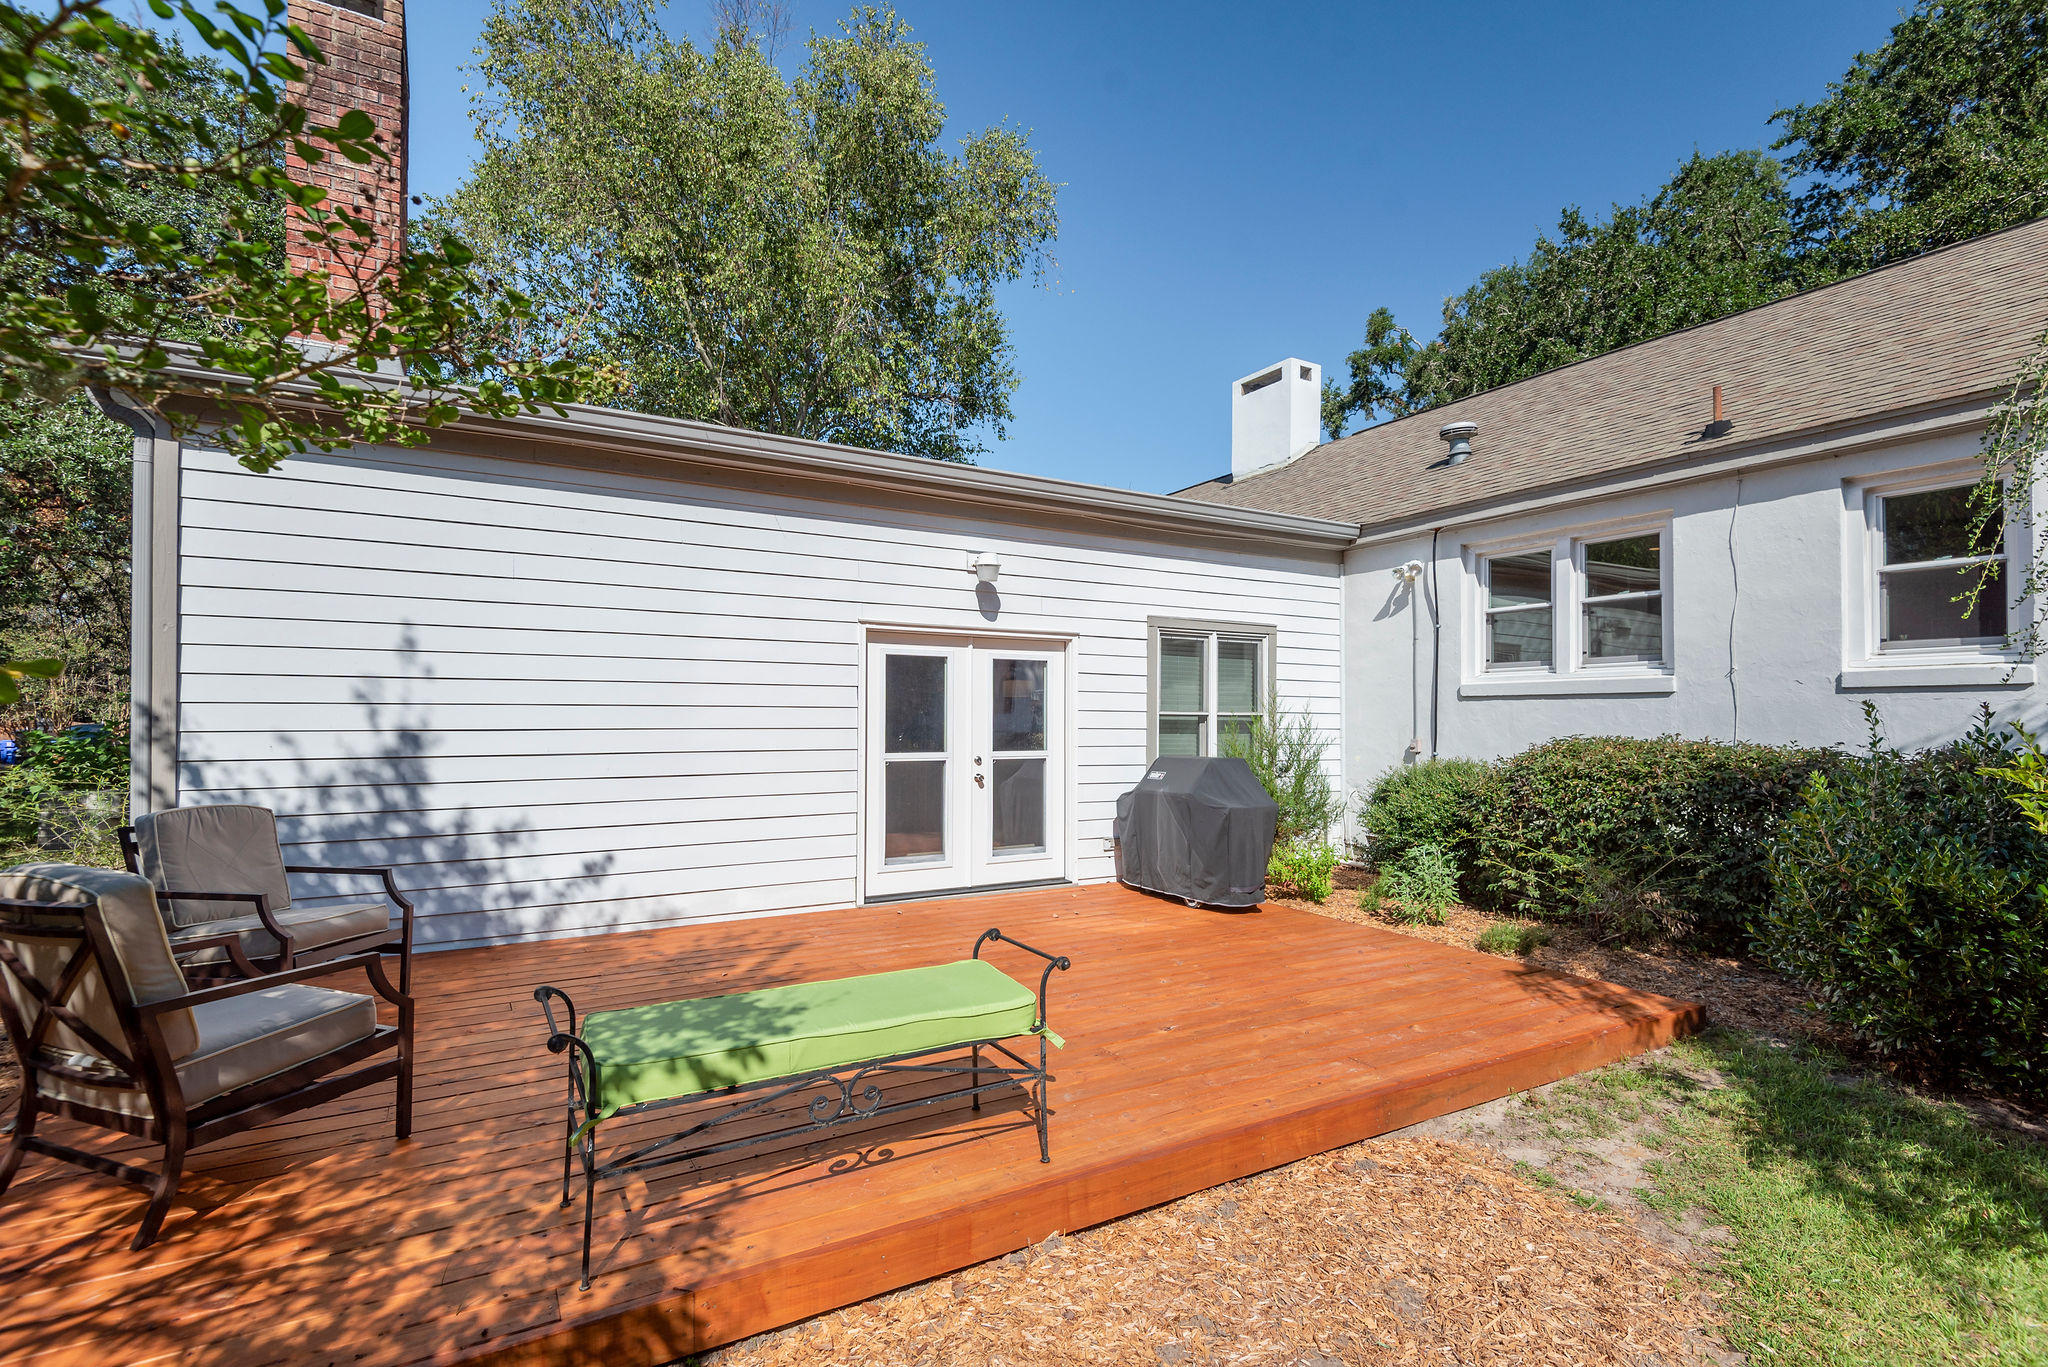 Sylvan Shores Homes For Sale - 450 Polony, Charleston, SC - 9